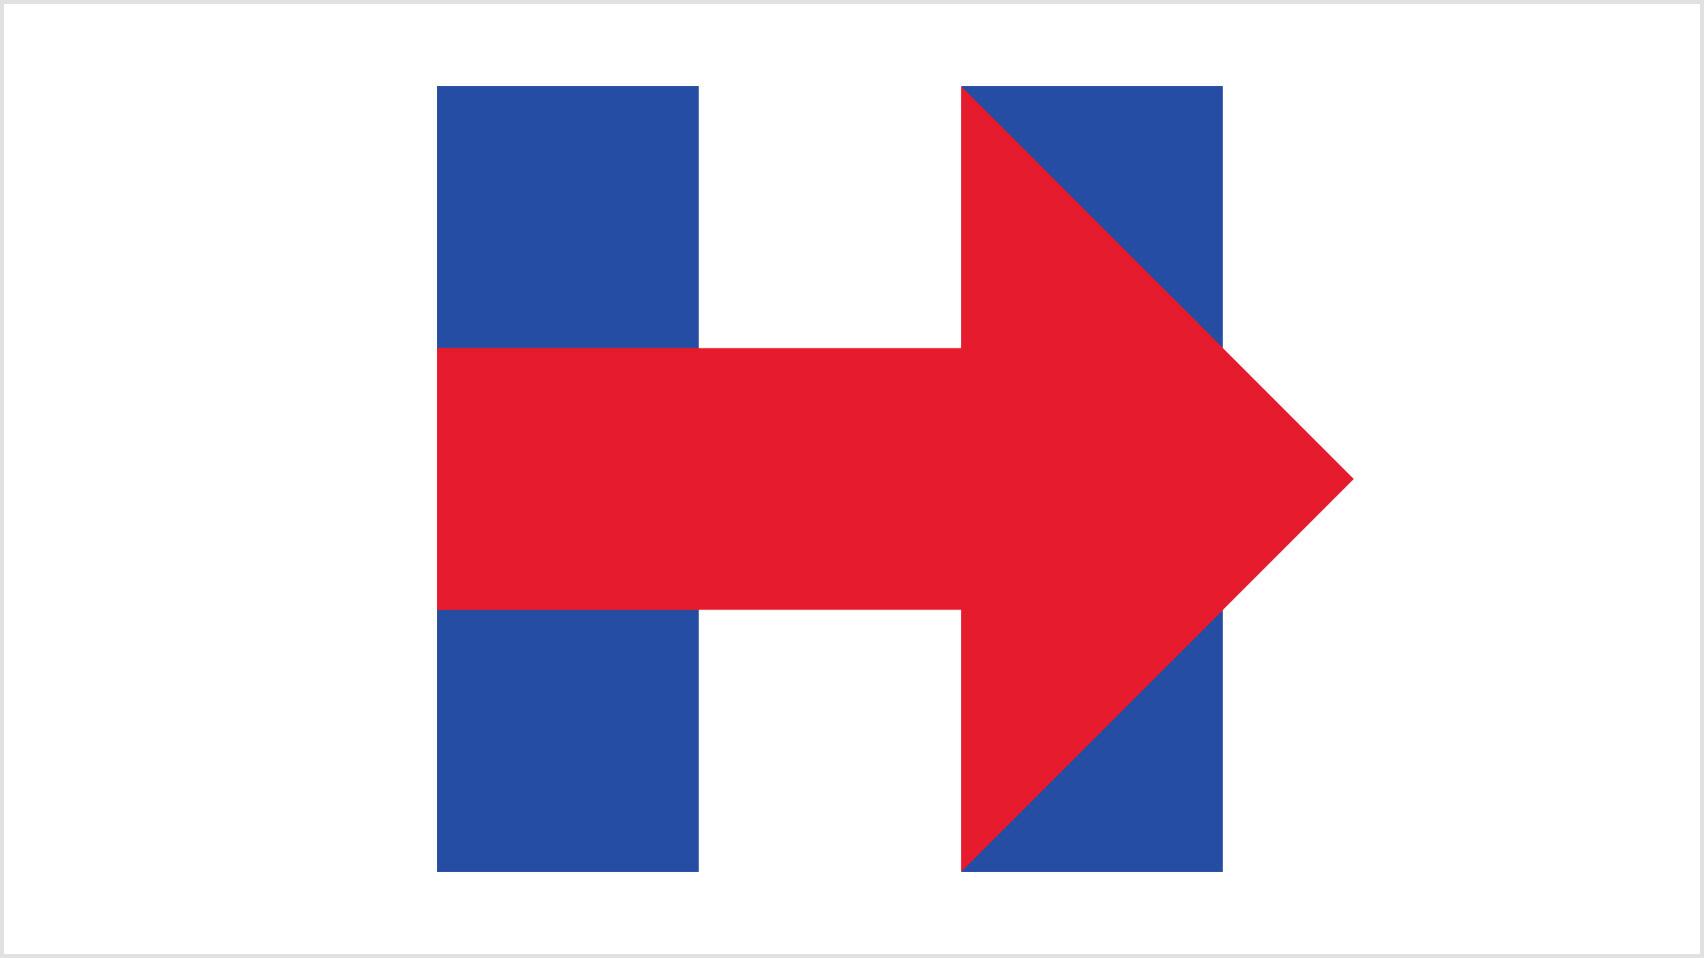 michael-bierut-hillary-clinton-logo-variations_dezeen-hero-1